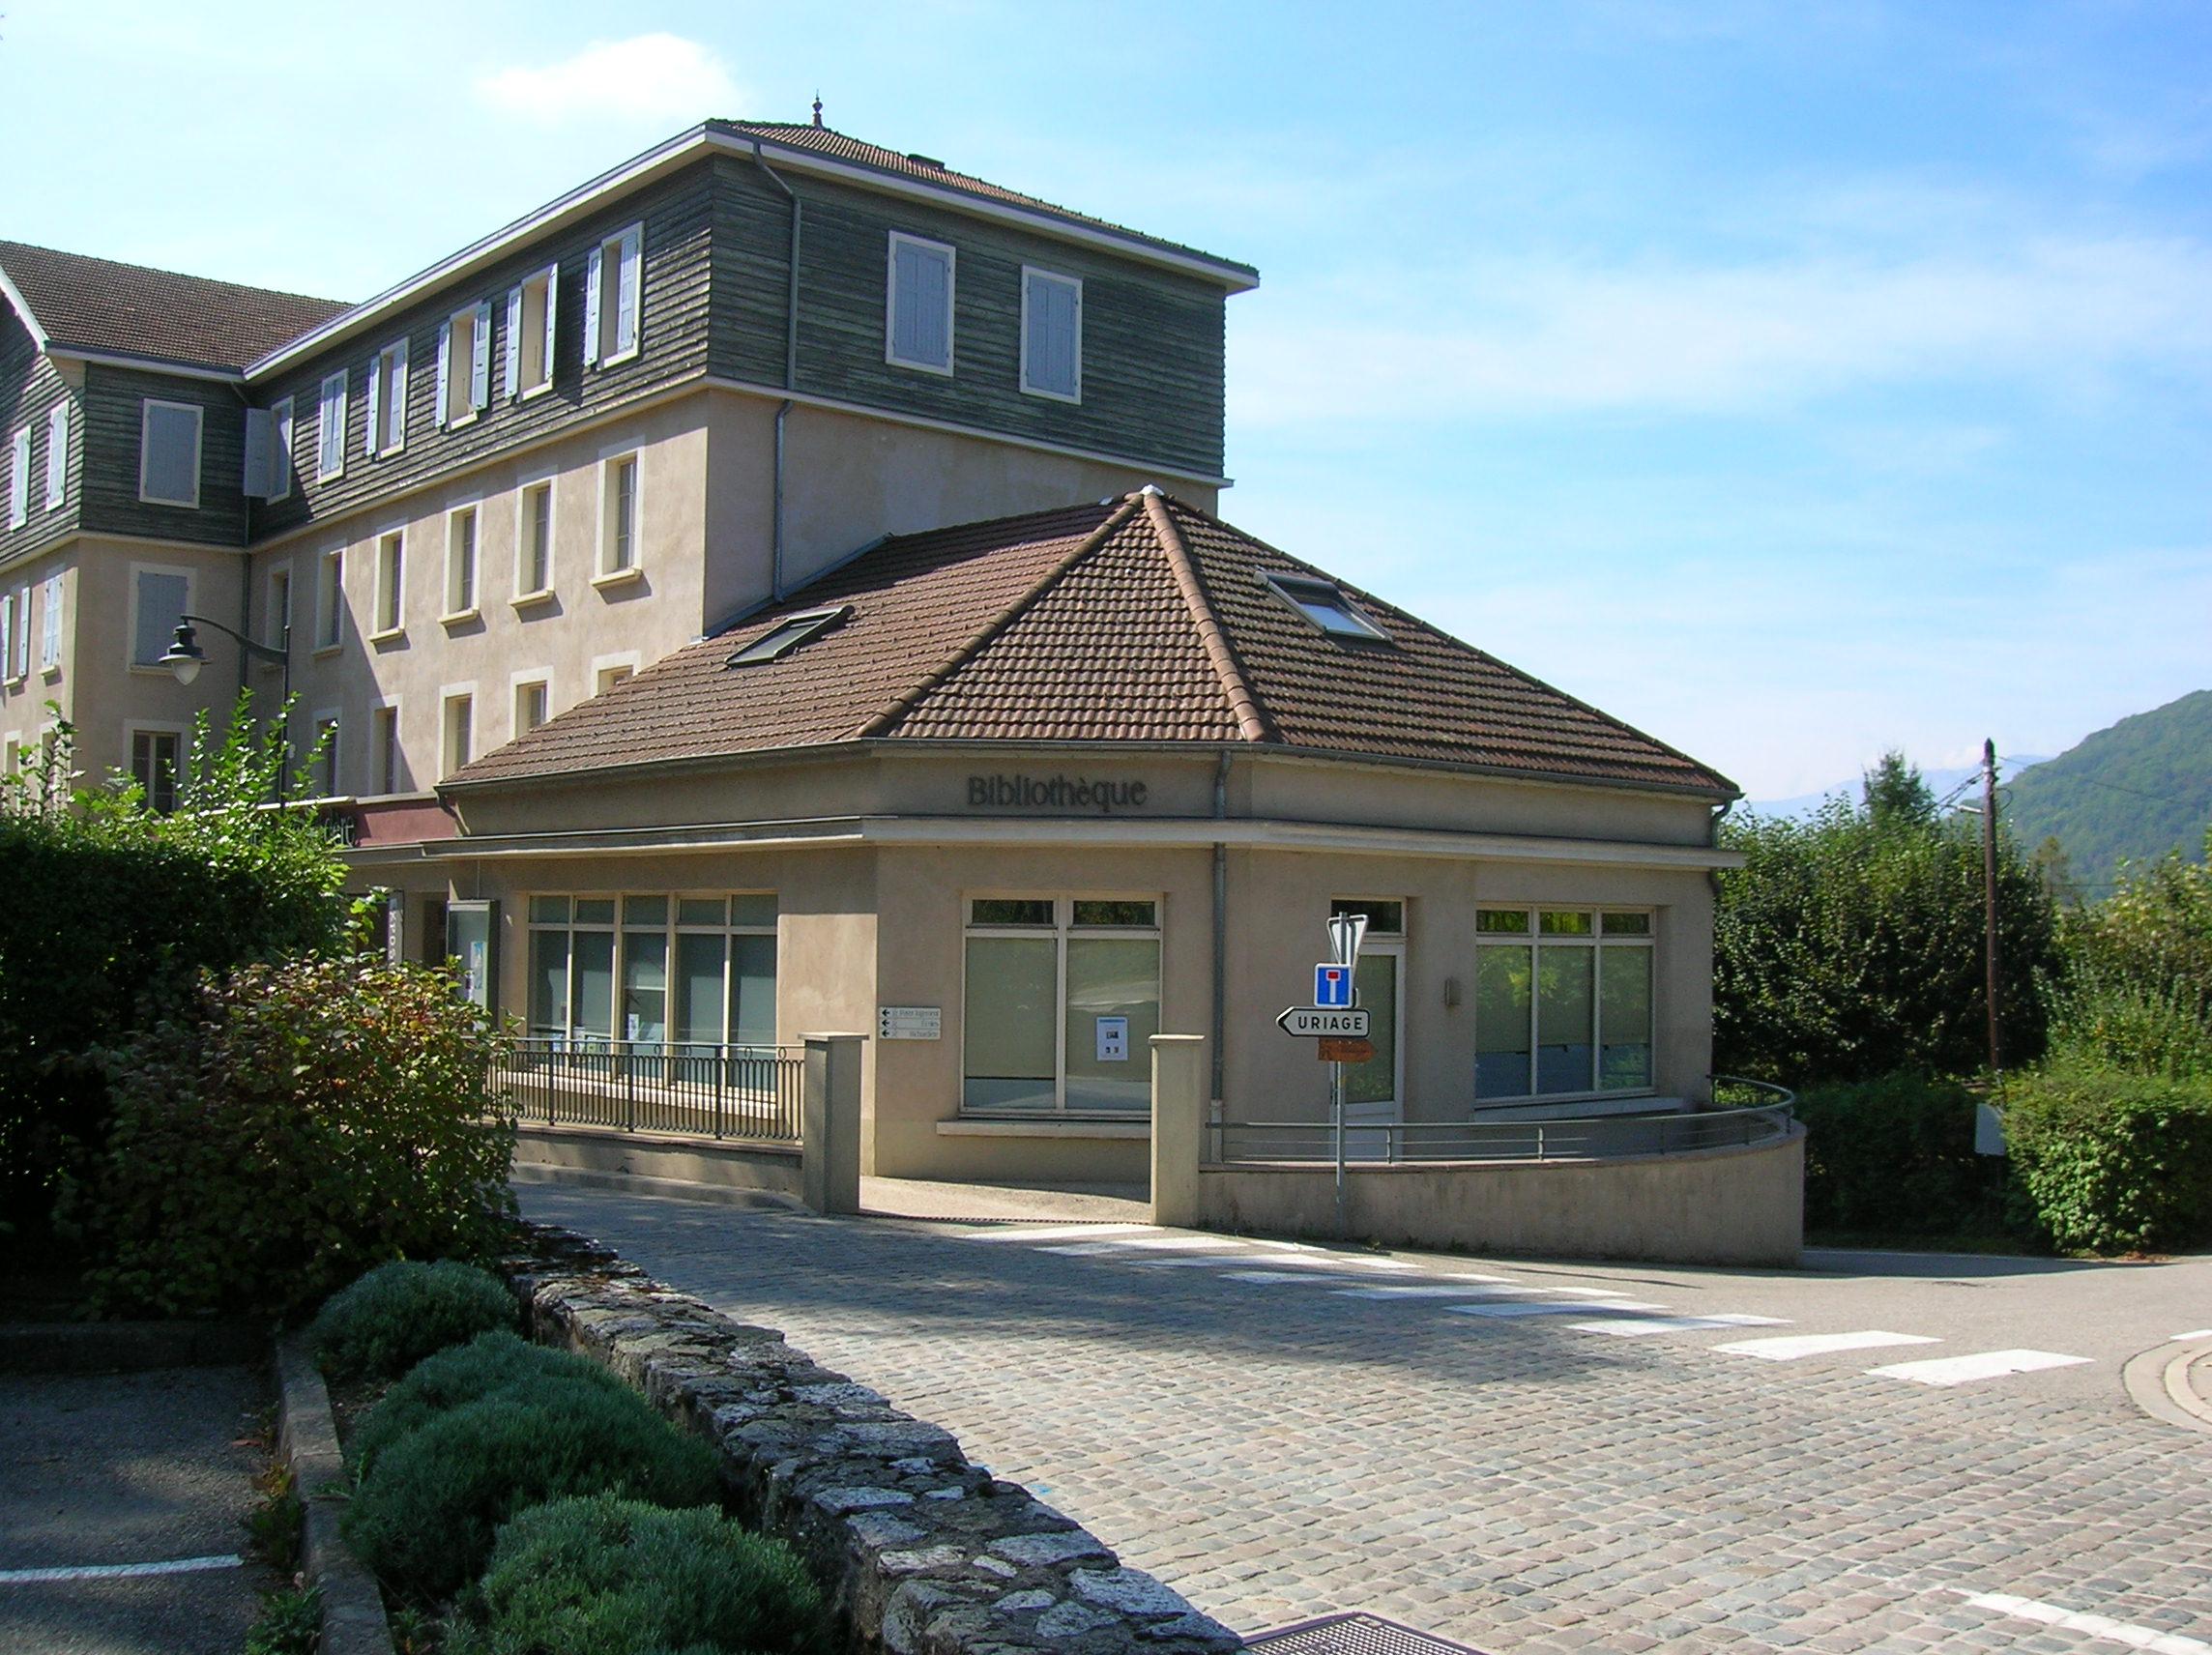 Bibliothèque Saint Martin D Uriage file:bourg st martin uriage 2 bibliothèque - wikimedia